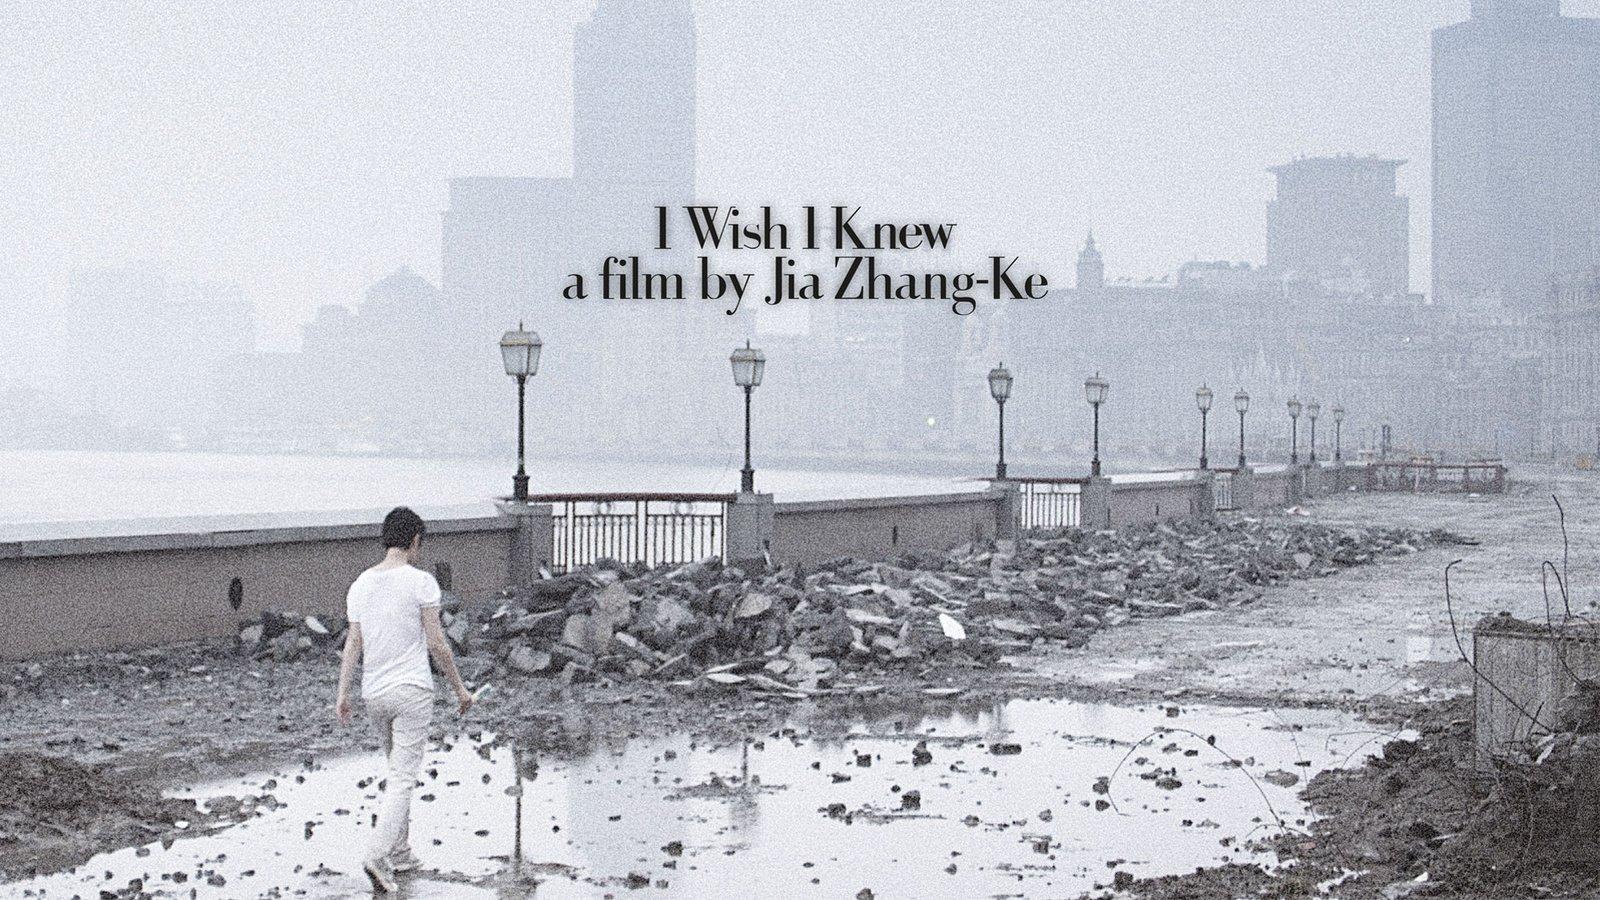 I Wish I Knew - Hai shang chuan qi